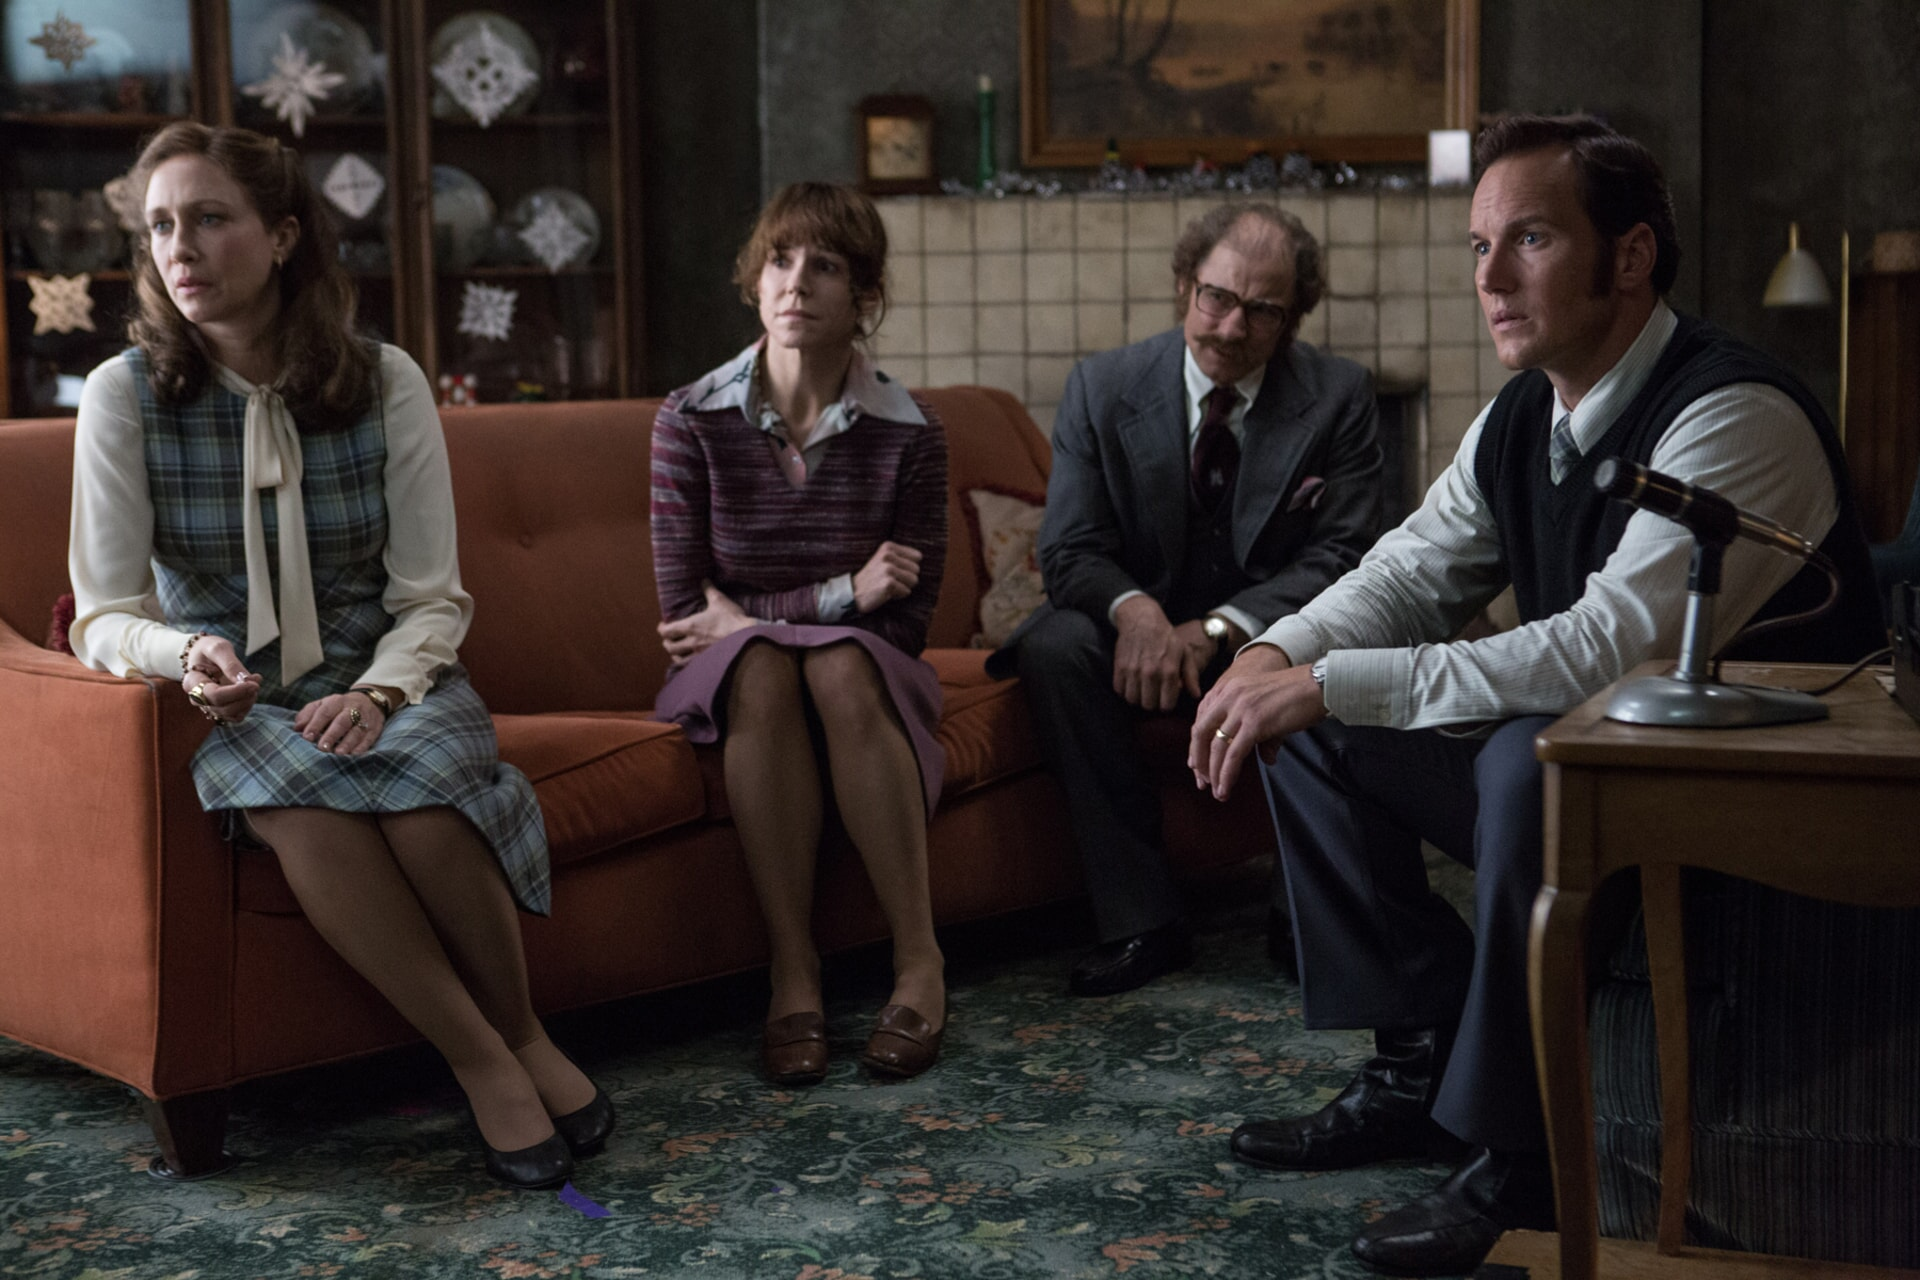 VERA FARMIGA as Lorraine Warren, FRANCES O'CONNOR as Peggy Hodgson, SIMON McBURNEY as Maurice Grosse and PATRICK WILSON as Ed Warren sitting together in a semi-circle on orange sofas